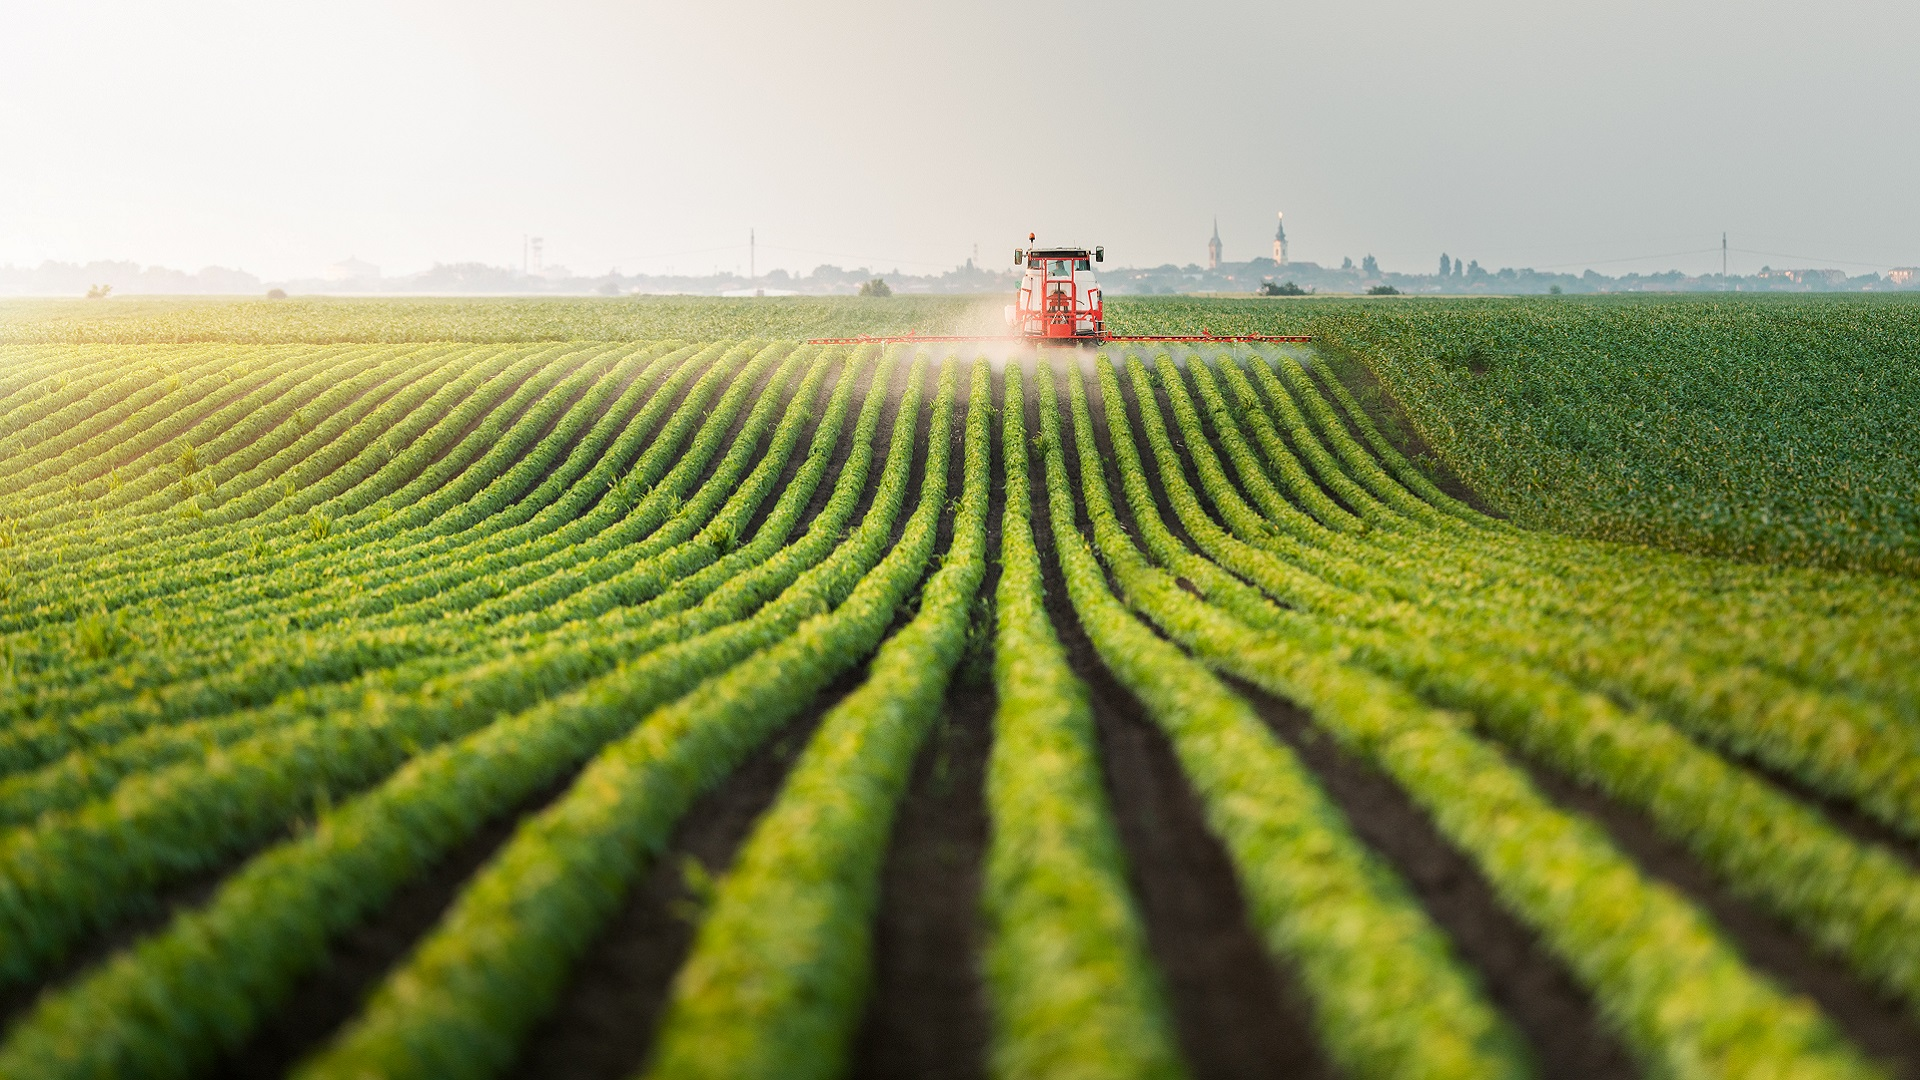 harvesting a green field